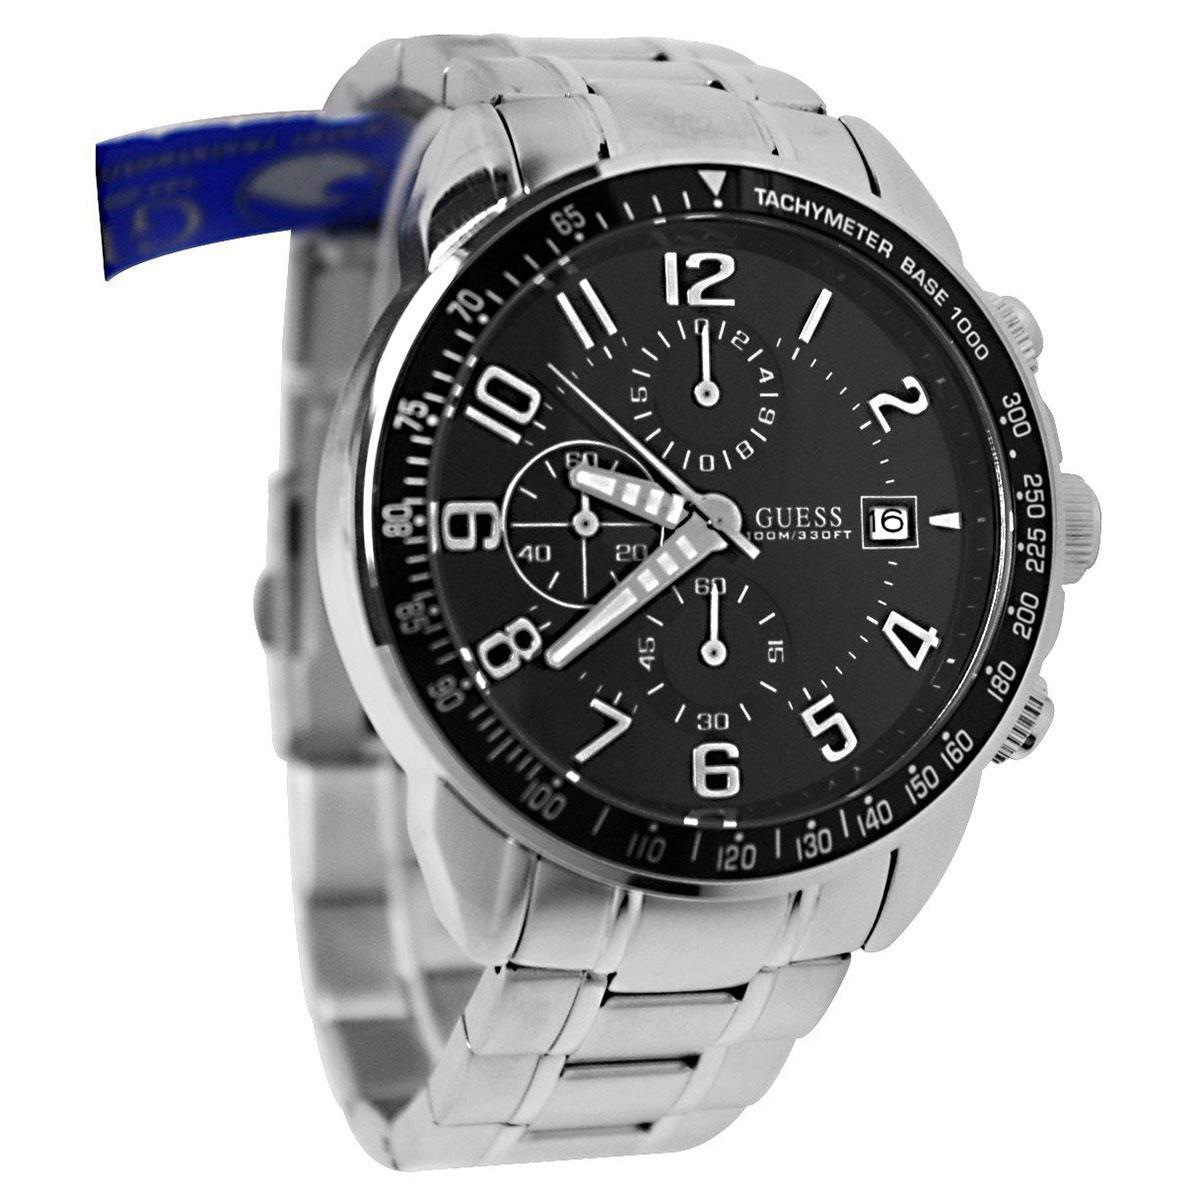 Guess W0658g1 Vertigo Jam Tangan Pria Navy Blue Leather Case W0479g3 Multifunction Strap Stainless Steel Silver Quartz Bracelet Mens Nwt Warranty